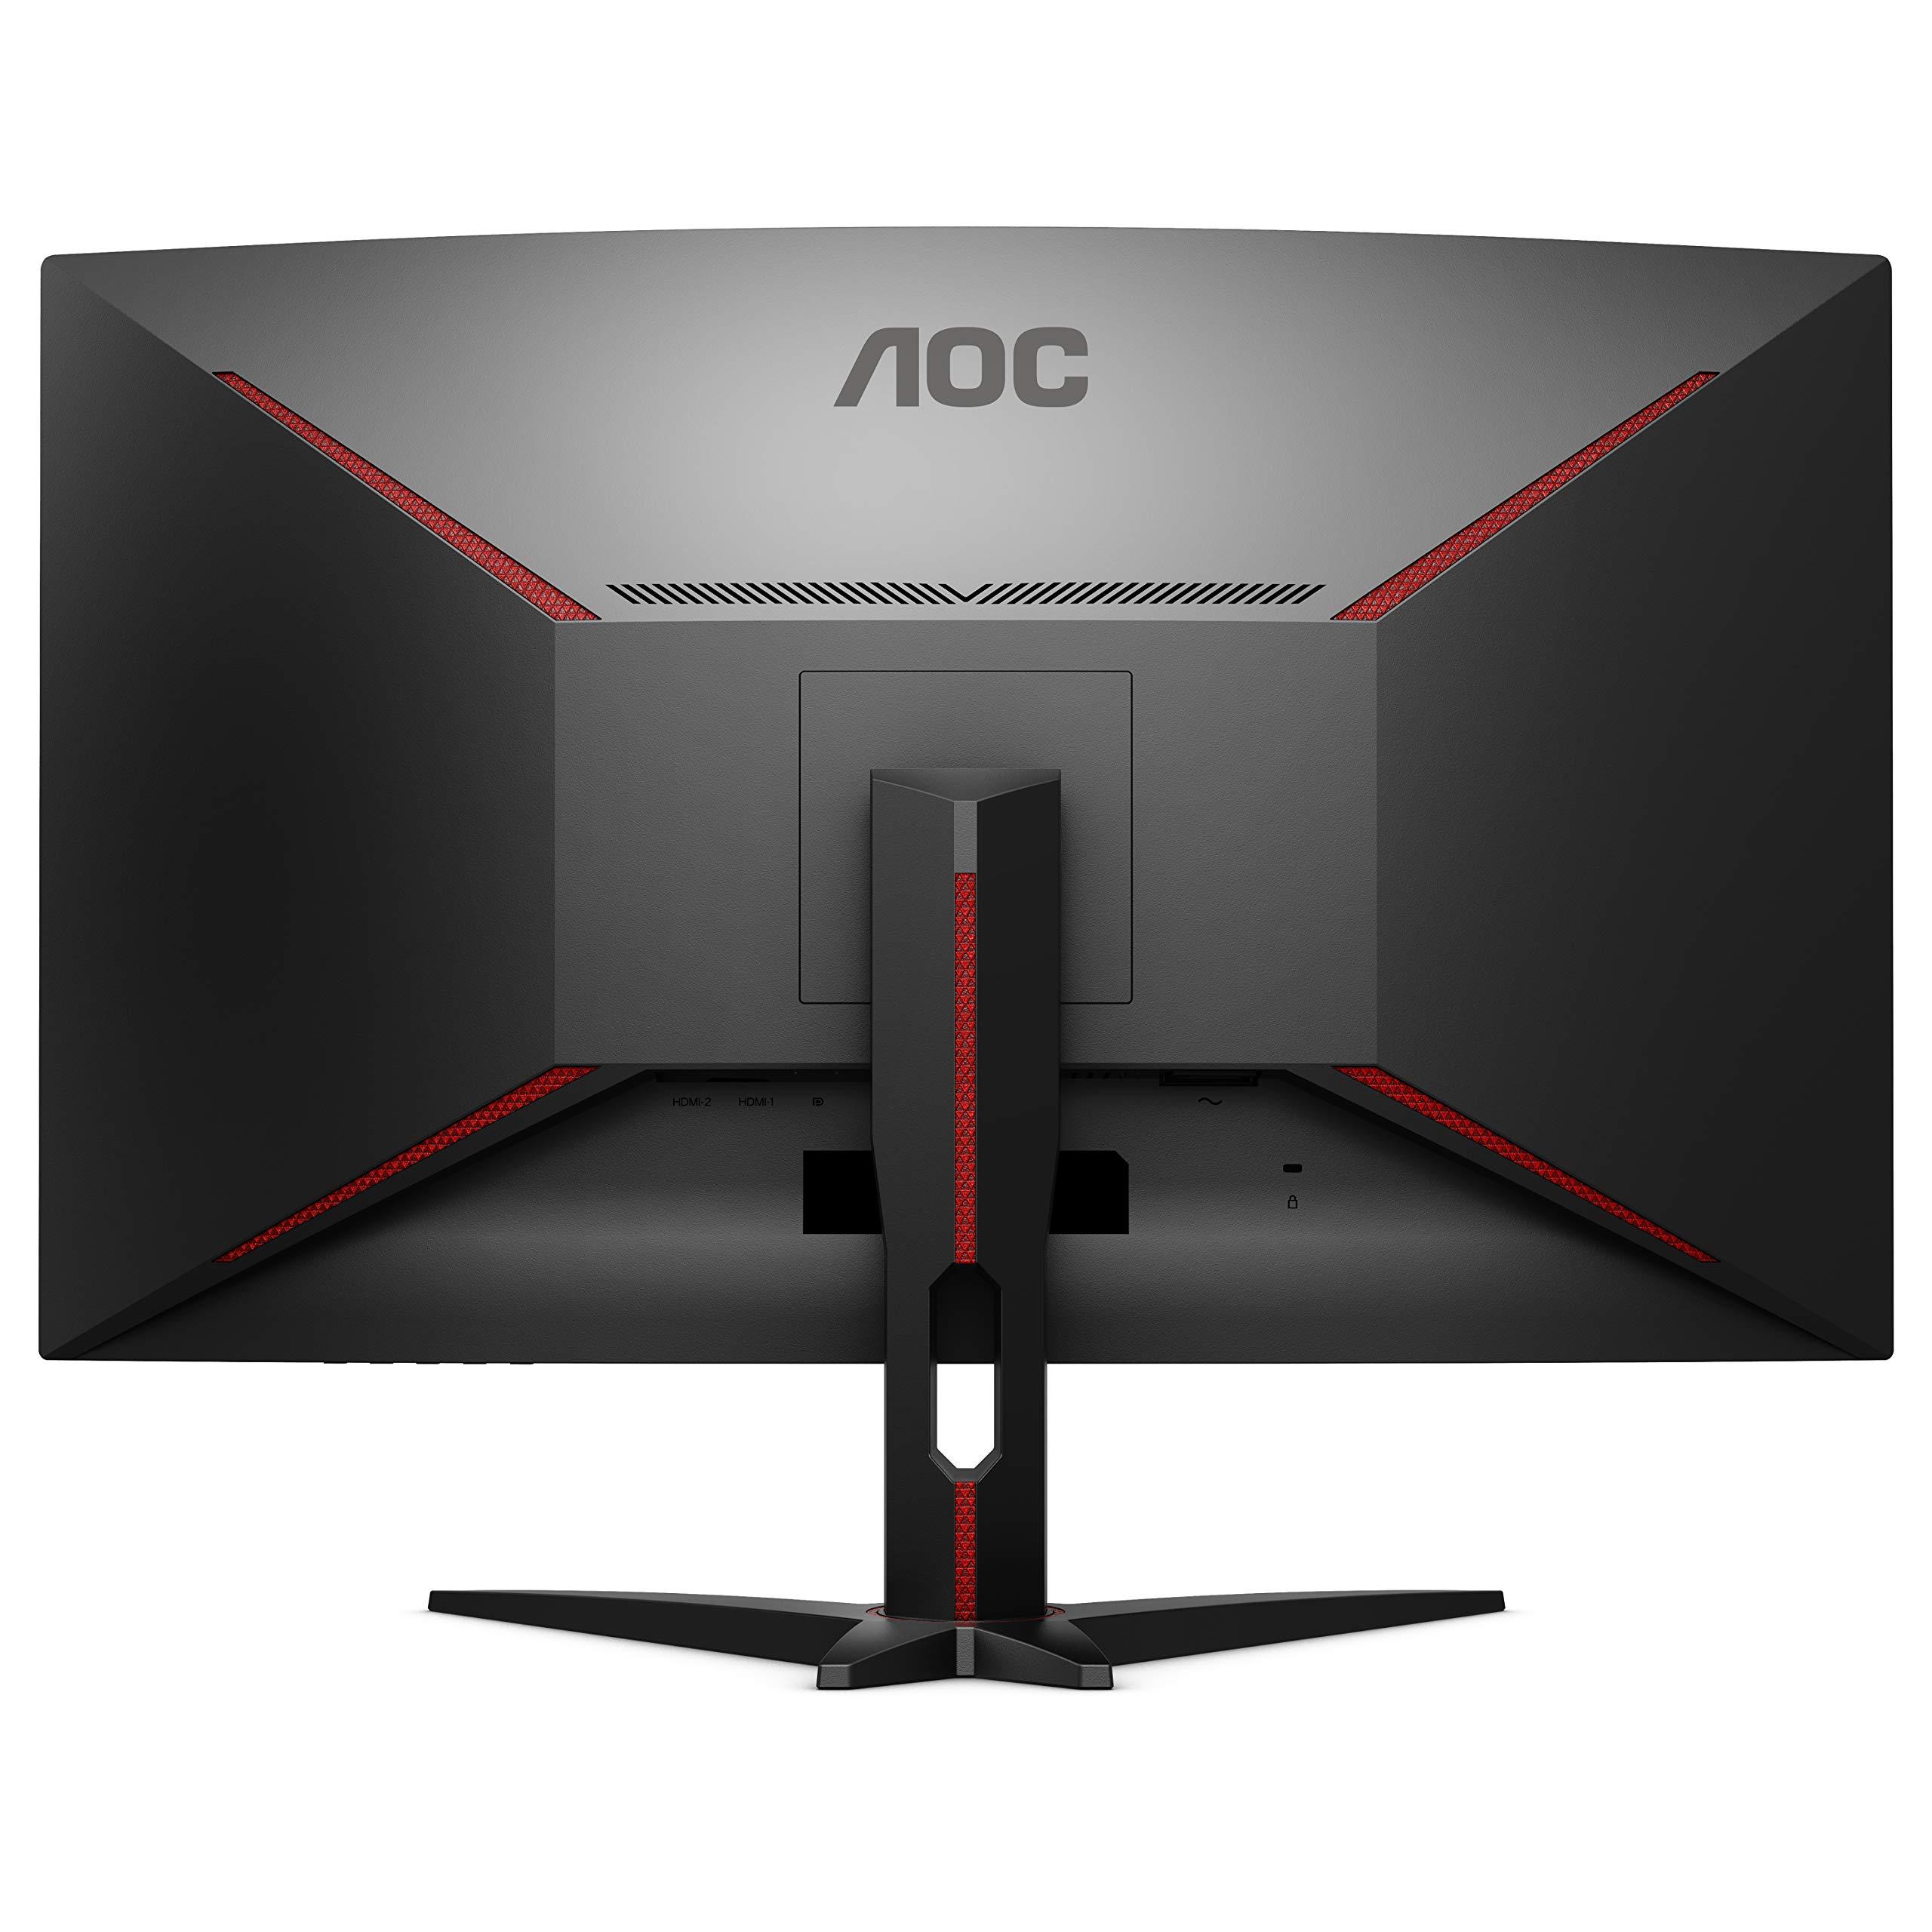 AOC C32G1 31.5'' Curved Frameless Gaming Monitor, FHD 1920x1080, VA Panel, 1ms MPRT, 144Hz, FreeSync, DisplayPort/HDMI/VGA, VESA by AOC (Image #1)